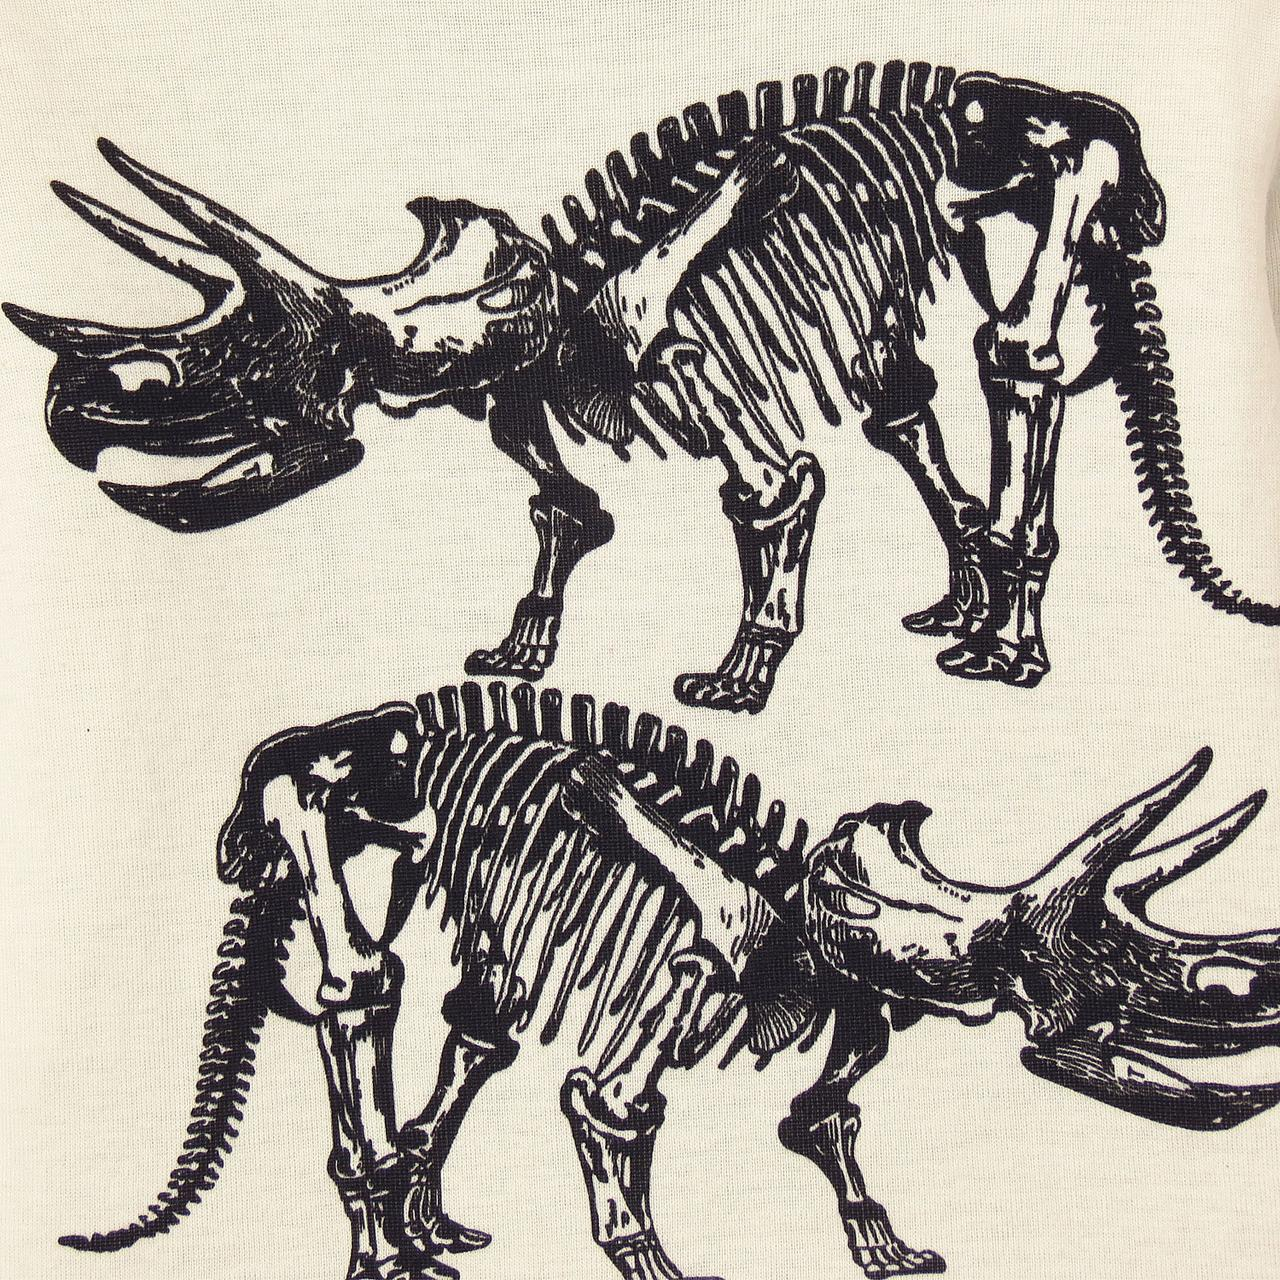 Пижама Динозавры Wibbly pigbaby  продажа d20e4f4a21d6d